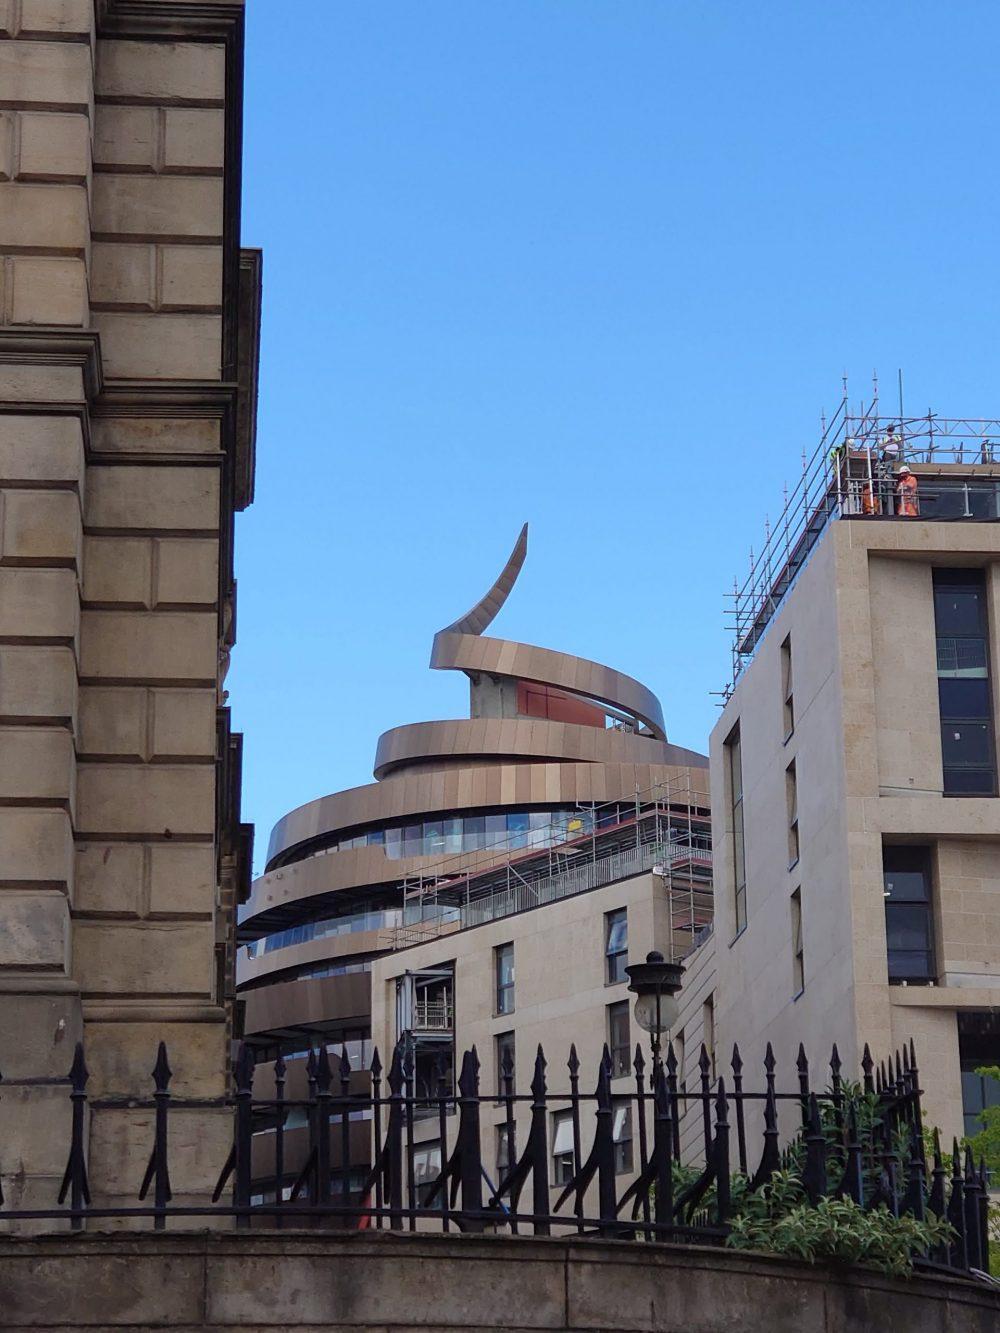 New one billion pound project St James Quarter almost finished Scottish News